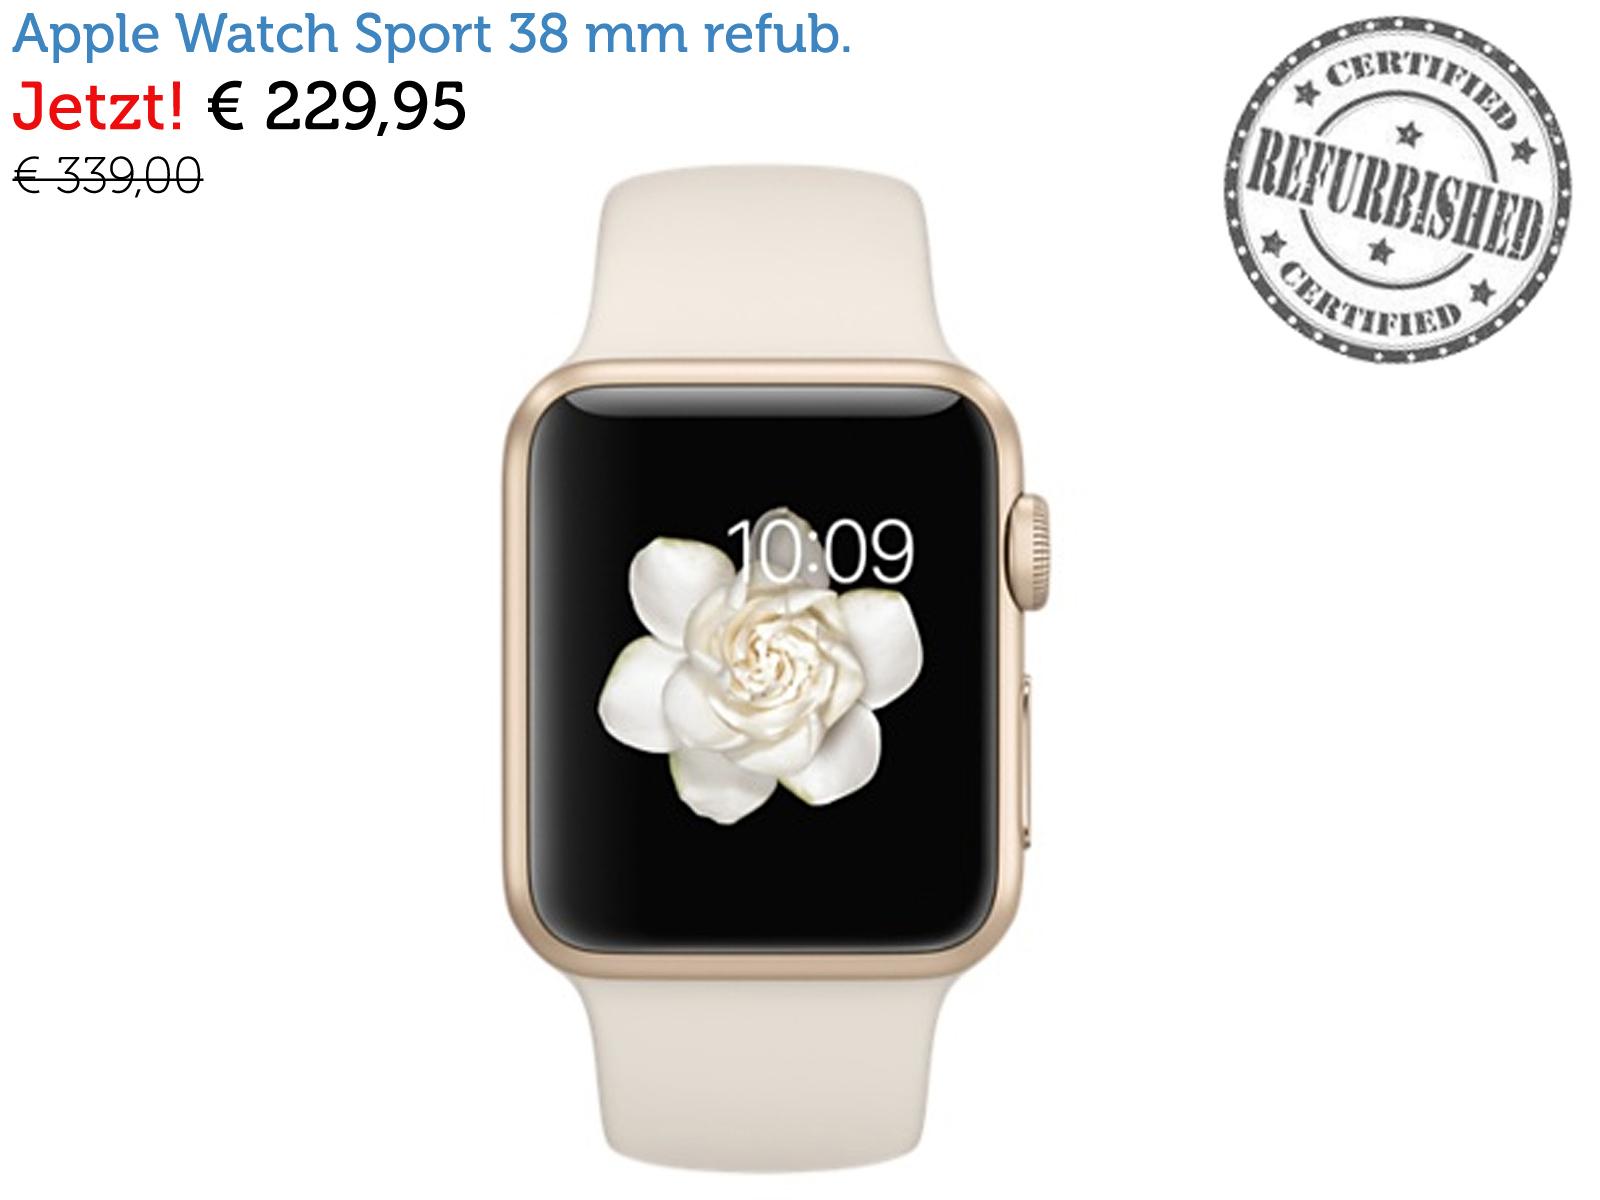 apple watch sport 42 mm offene verpackung refurbished von apple internet 39 s best online. Black Bedroom Furniture Sets. Home Design Ideas